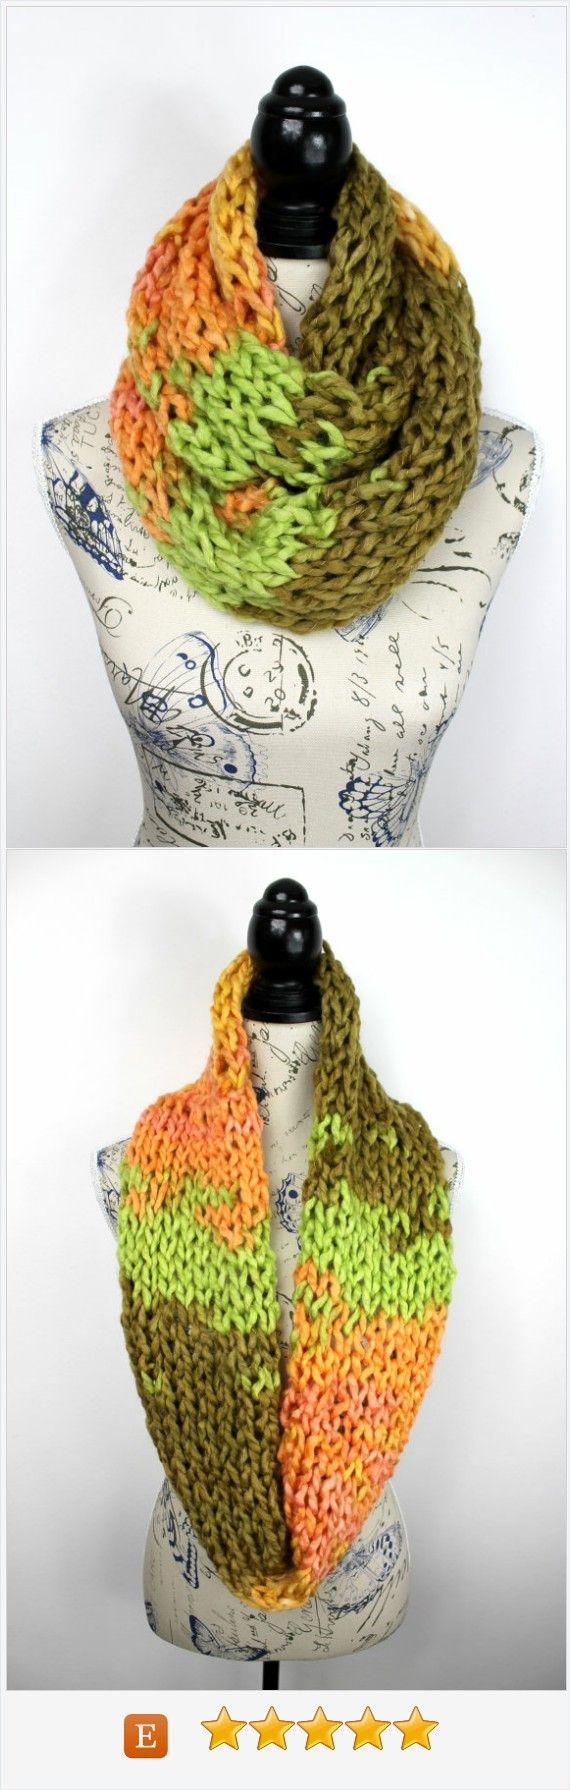 Super Chunky Scarf - Bulky Knit Scarf - Knit Snood Scarf - Eternity Scarf - winter knit Infinity - Knit Eternity Scarf - Multicolor Snood